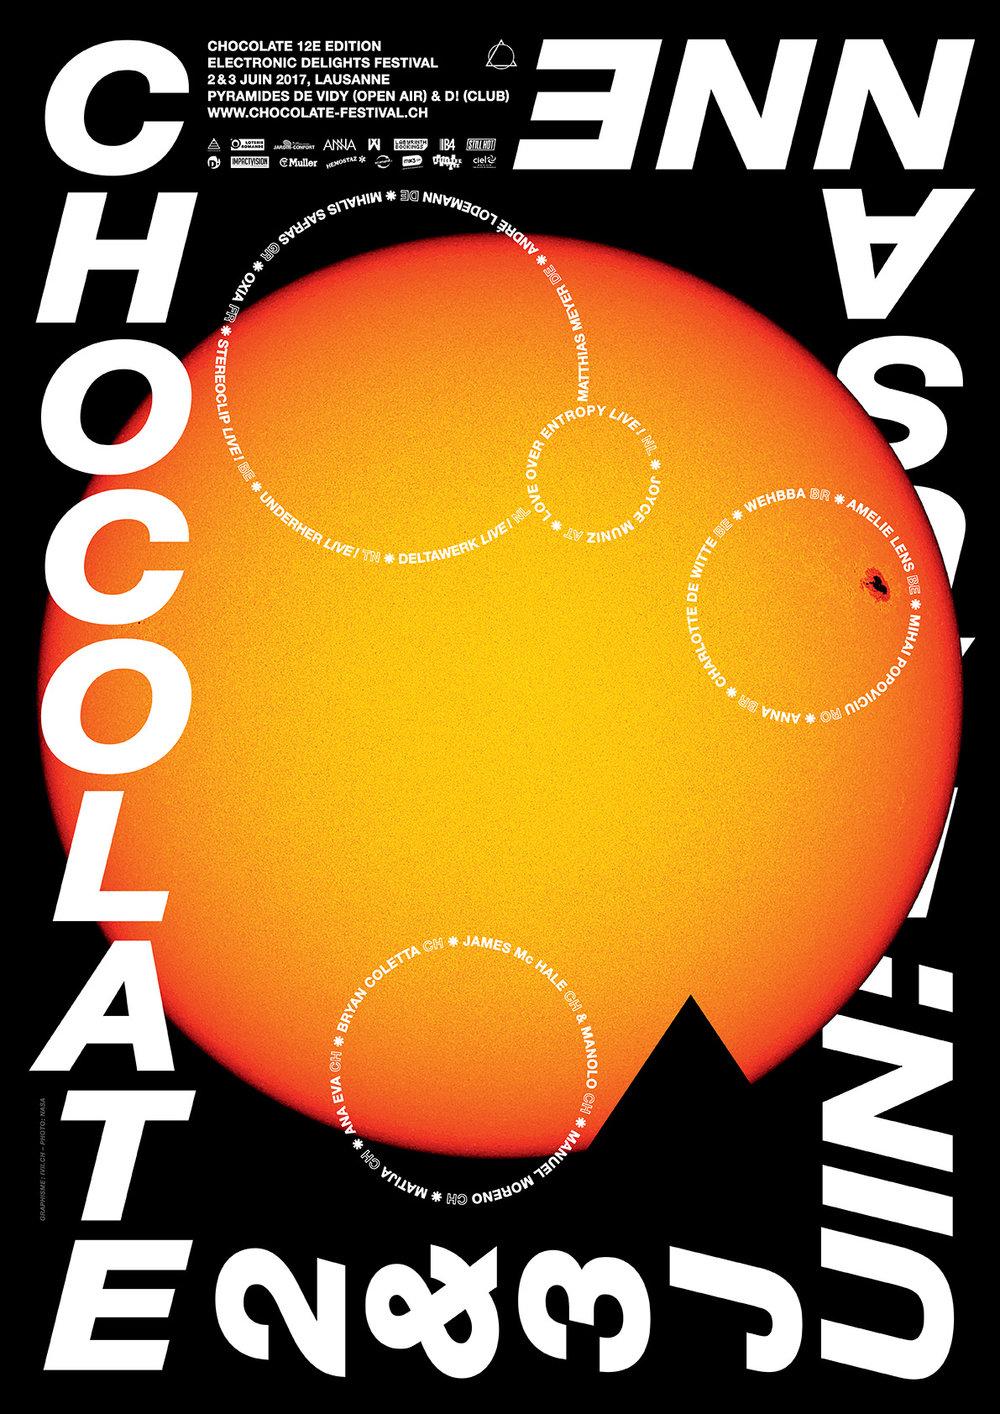 Chocolate 2017 - 2-3 juinOxia (FR), Wehbba (BR), Charlotte de Witte (BE), ANNA (BR) - Mihalis Safras (GR), Matthias Meyer (DE), Amelie Lens (BE), André Lodemann (DE), UNDERHER - Live! (TN), Stereoclip - Live! (BE), Mihai Popoviciu (RO), Deltawerk - Live (NL), Joyce Muniz (AT), Love Over Entropy - Live! (NL), Manuel Moreno (CH), Matija (CH), James Mc Hale (CH), Manolo (Lausanne), Bryan Coletta (CH), Ana Eva (CH).After-party : D! ClubAffluence : 4'500 personnes— Photo